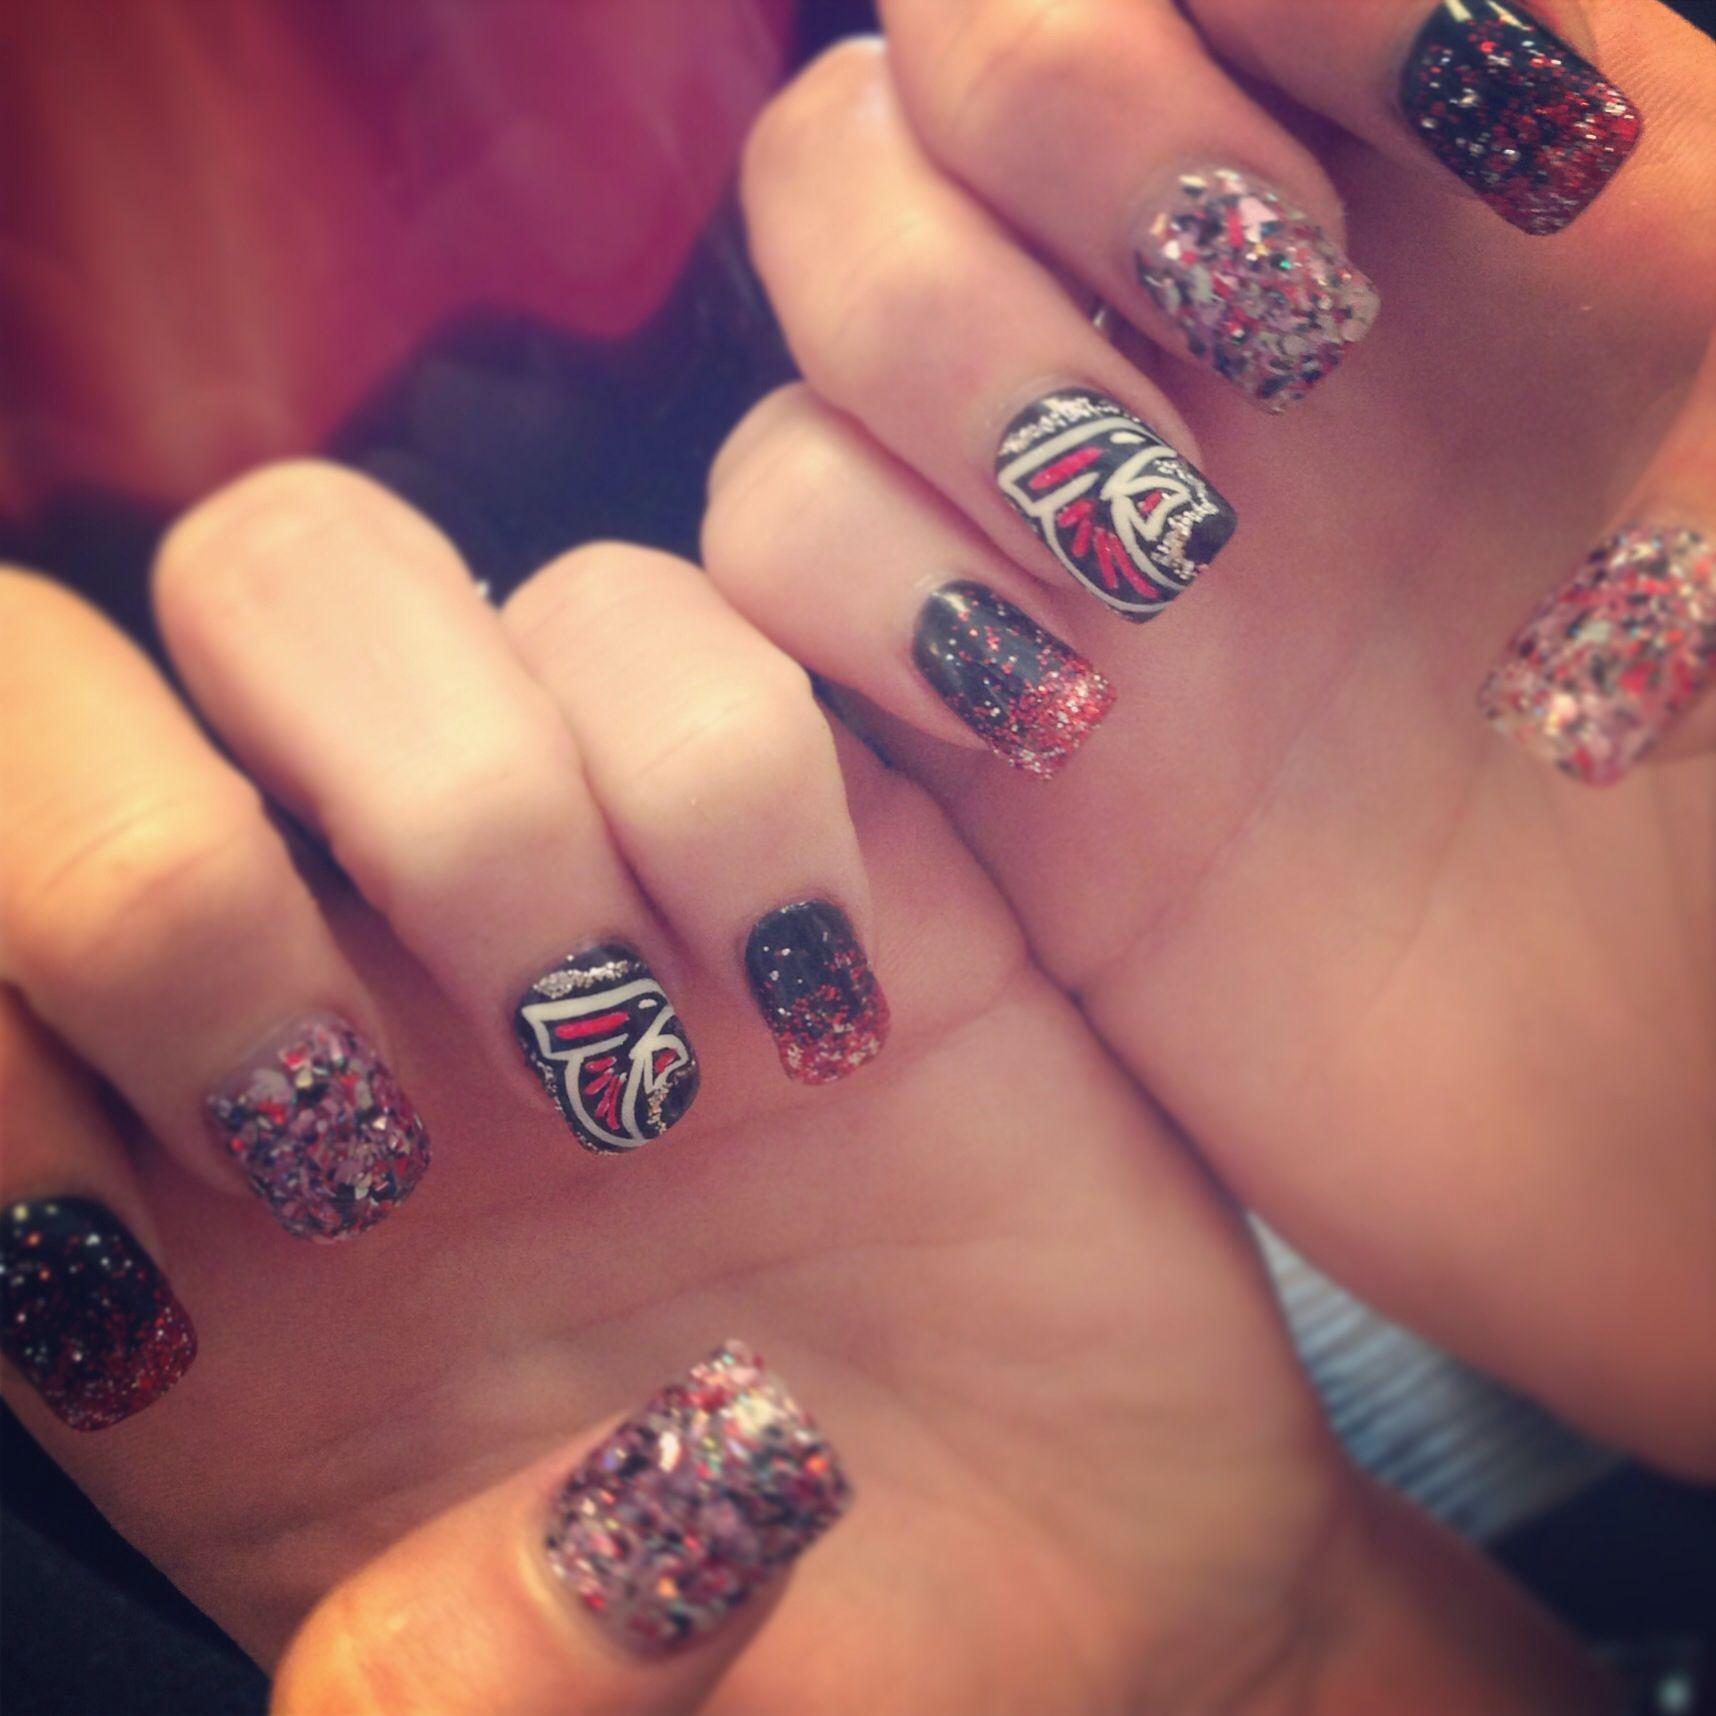 Falcon nails   Nails by The Haute Spot   Pinterest   Falcons ...